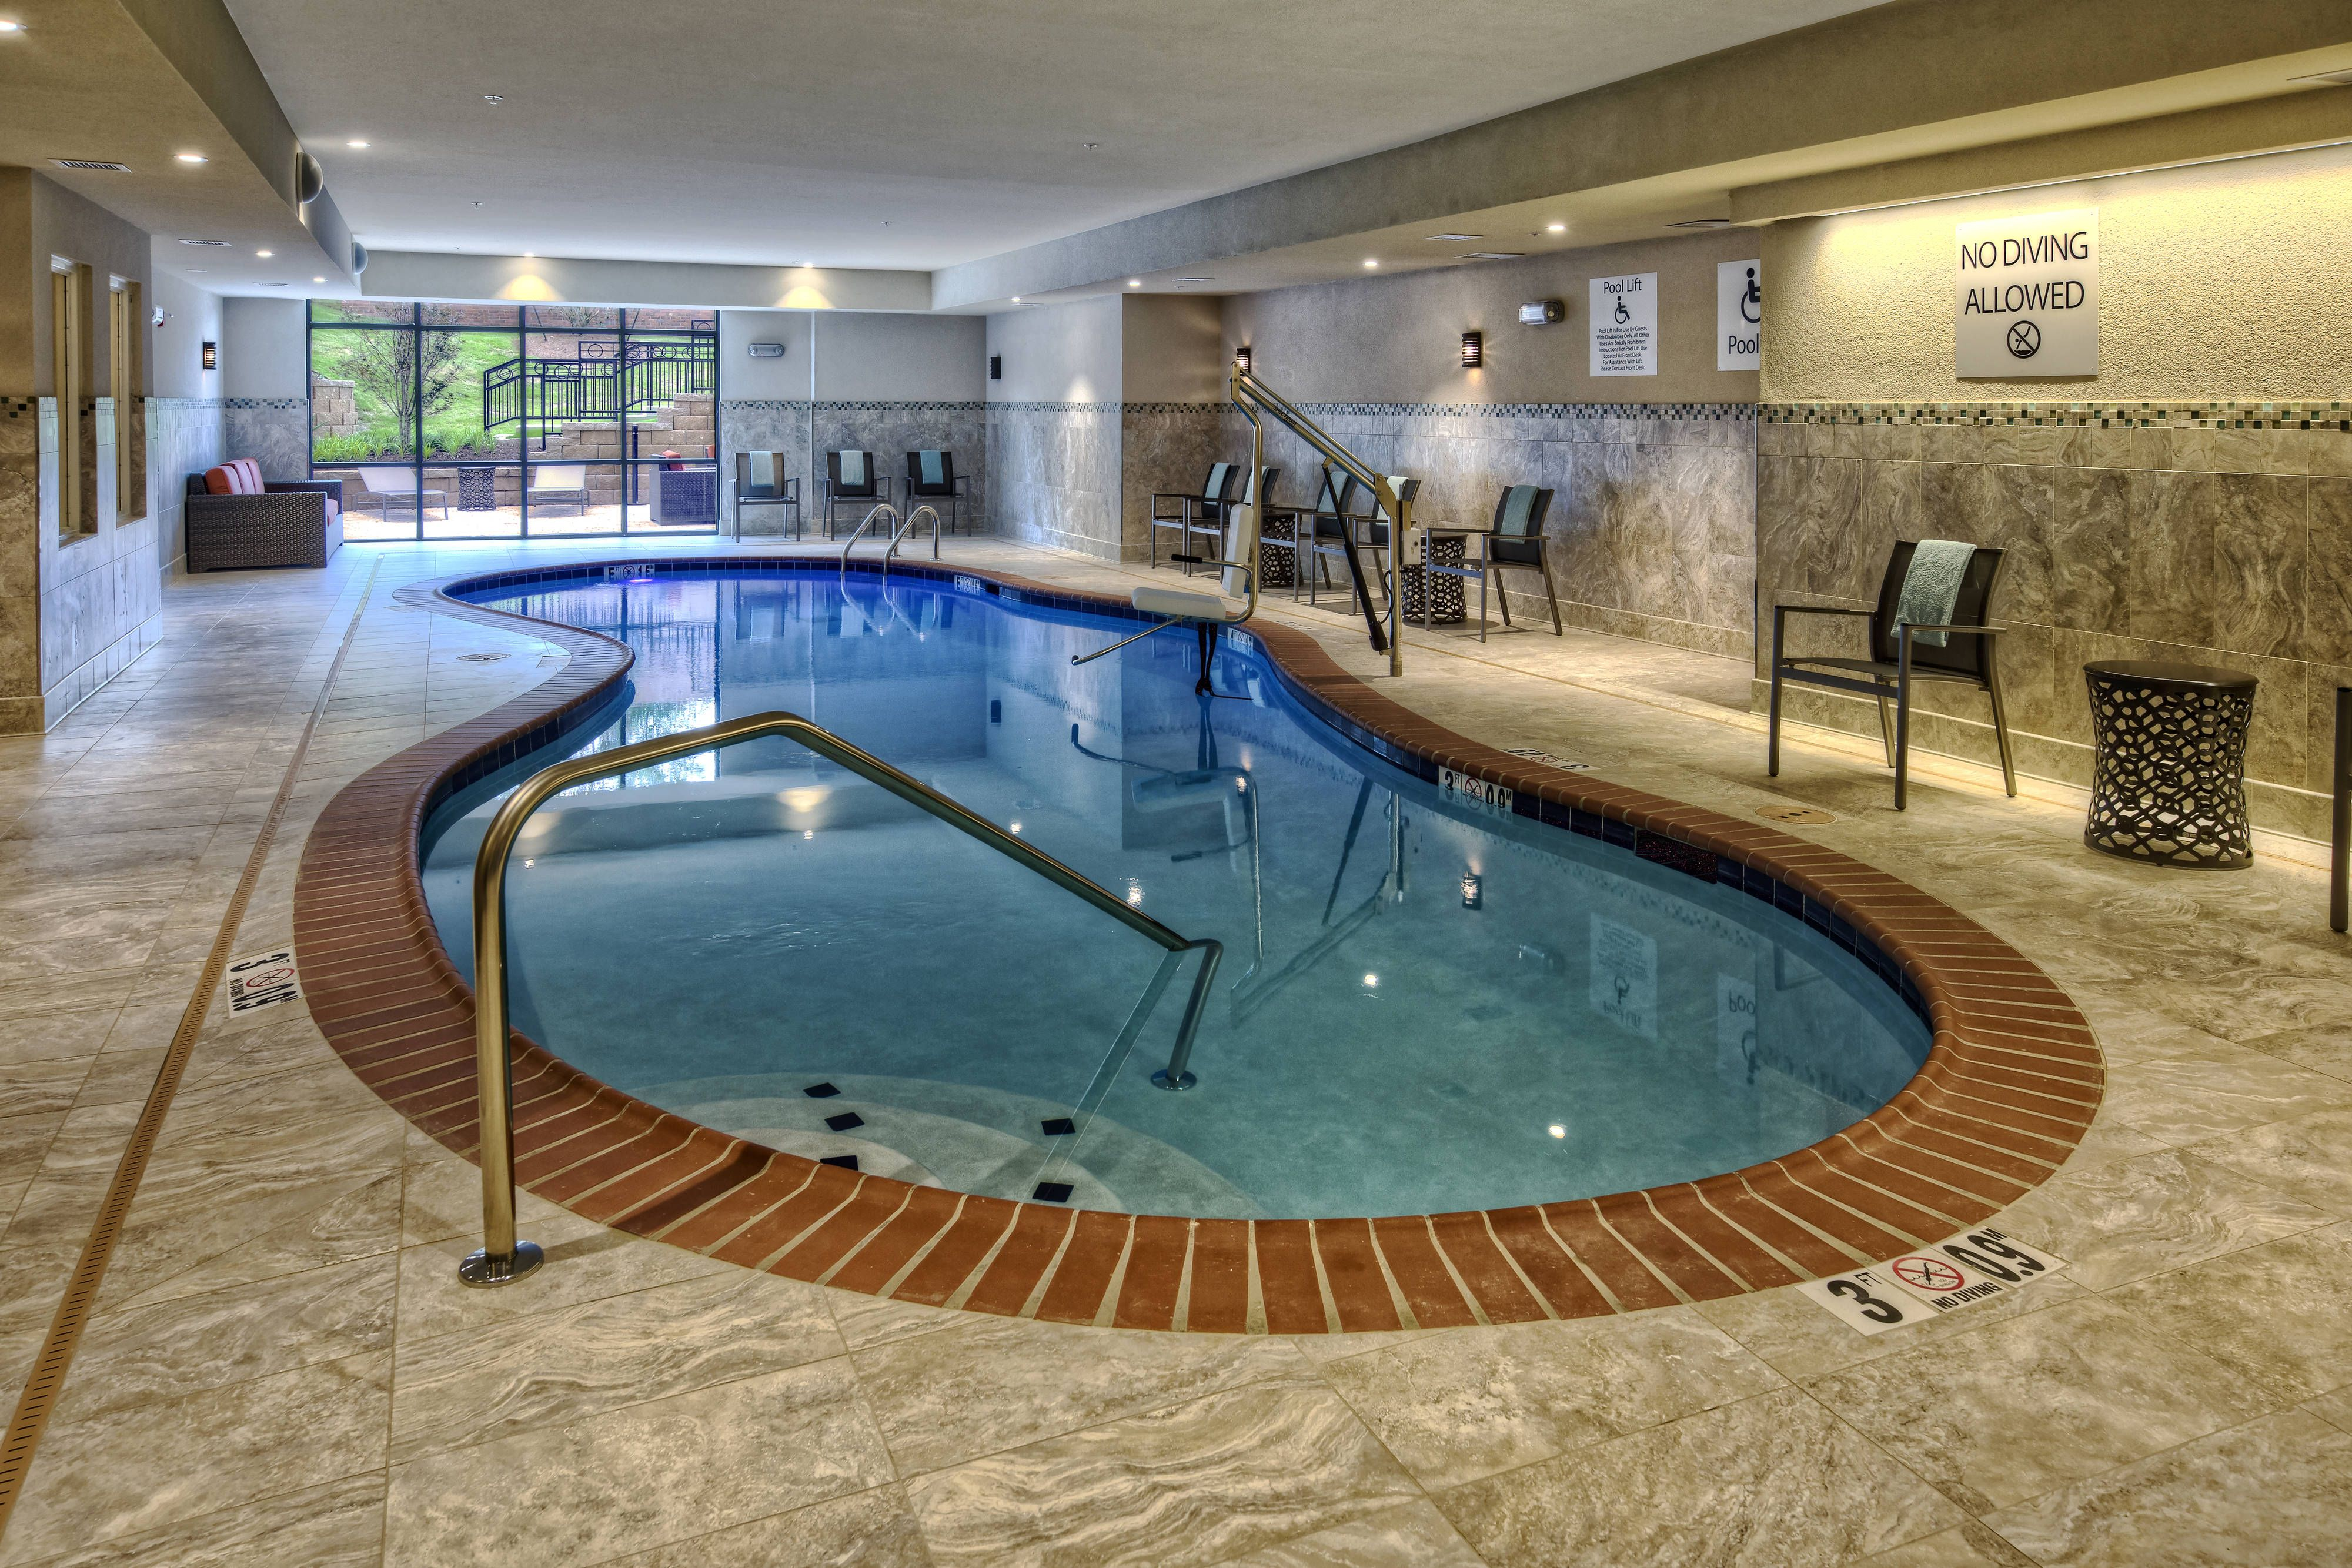 Courtyard Oxford Indoor Pool Comfortable Traveling Holiday Indoor Pool Courtyard Hotel